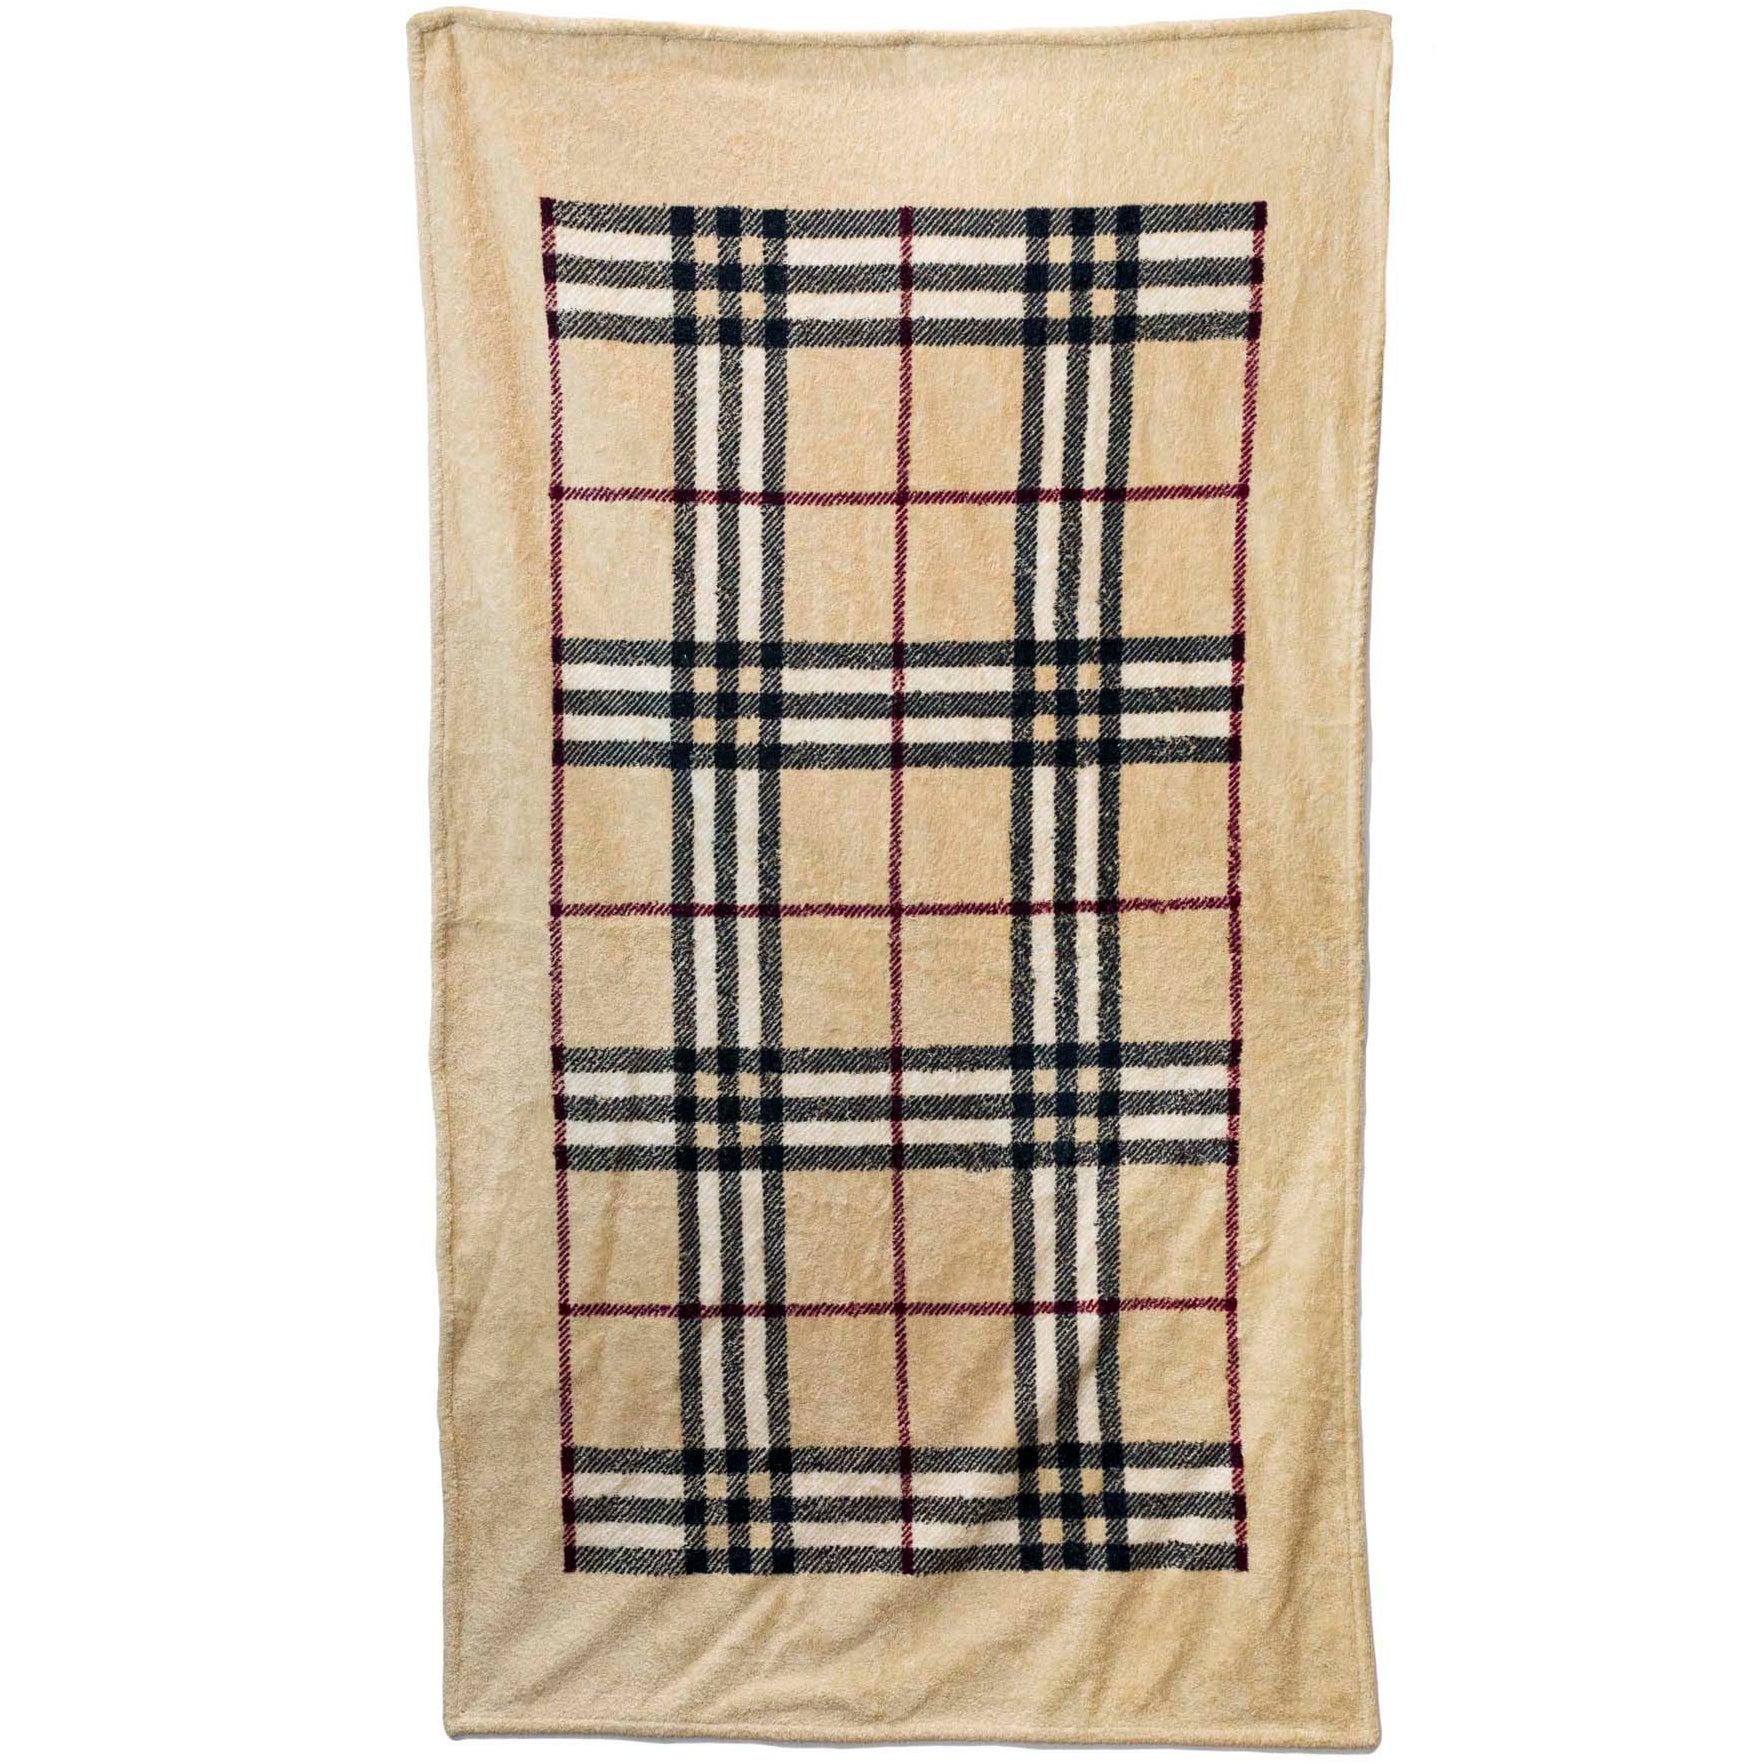 6b07bc0cce44 Burberry Large Tan Nova Check Towel Nwt At 1stdibs